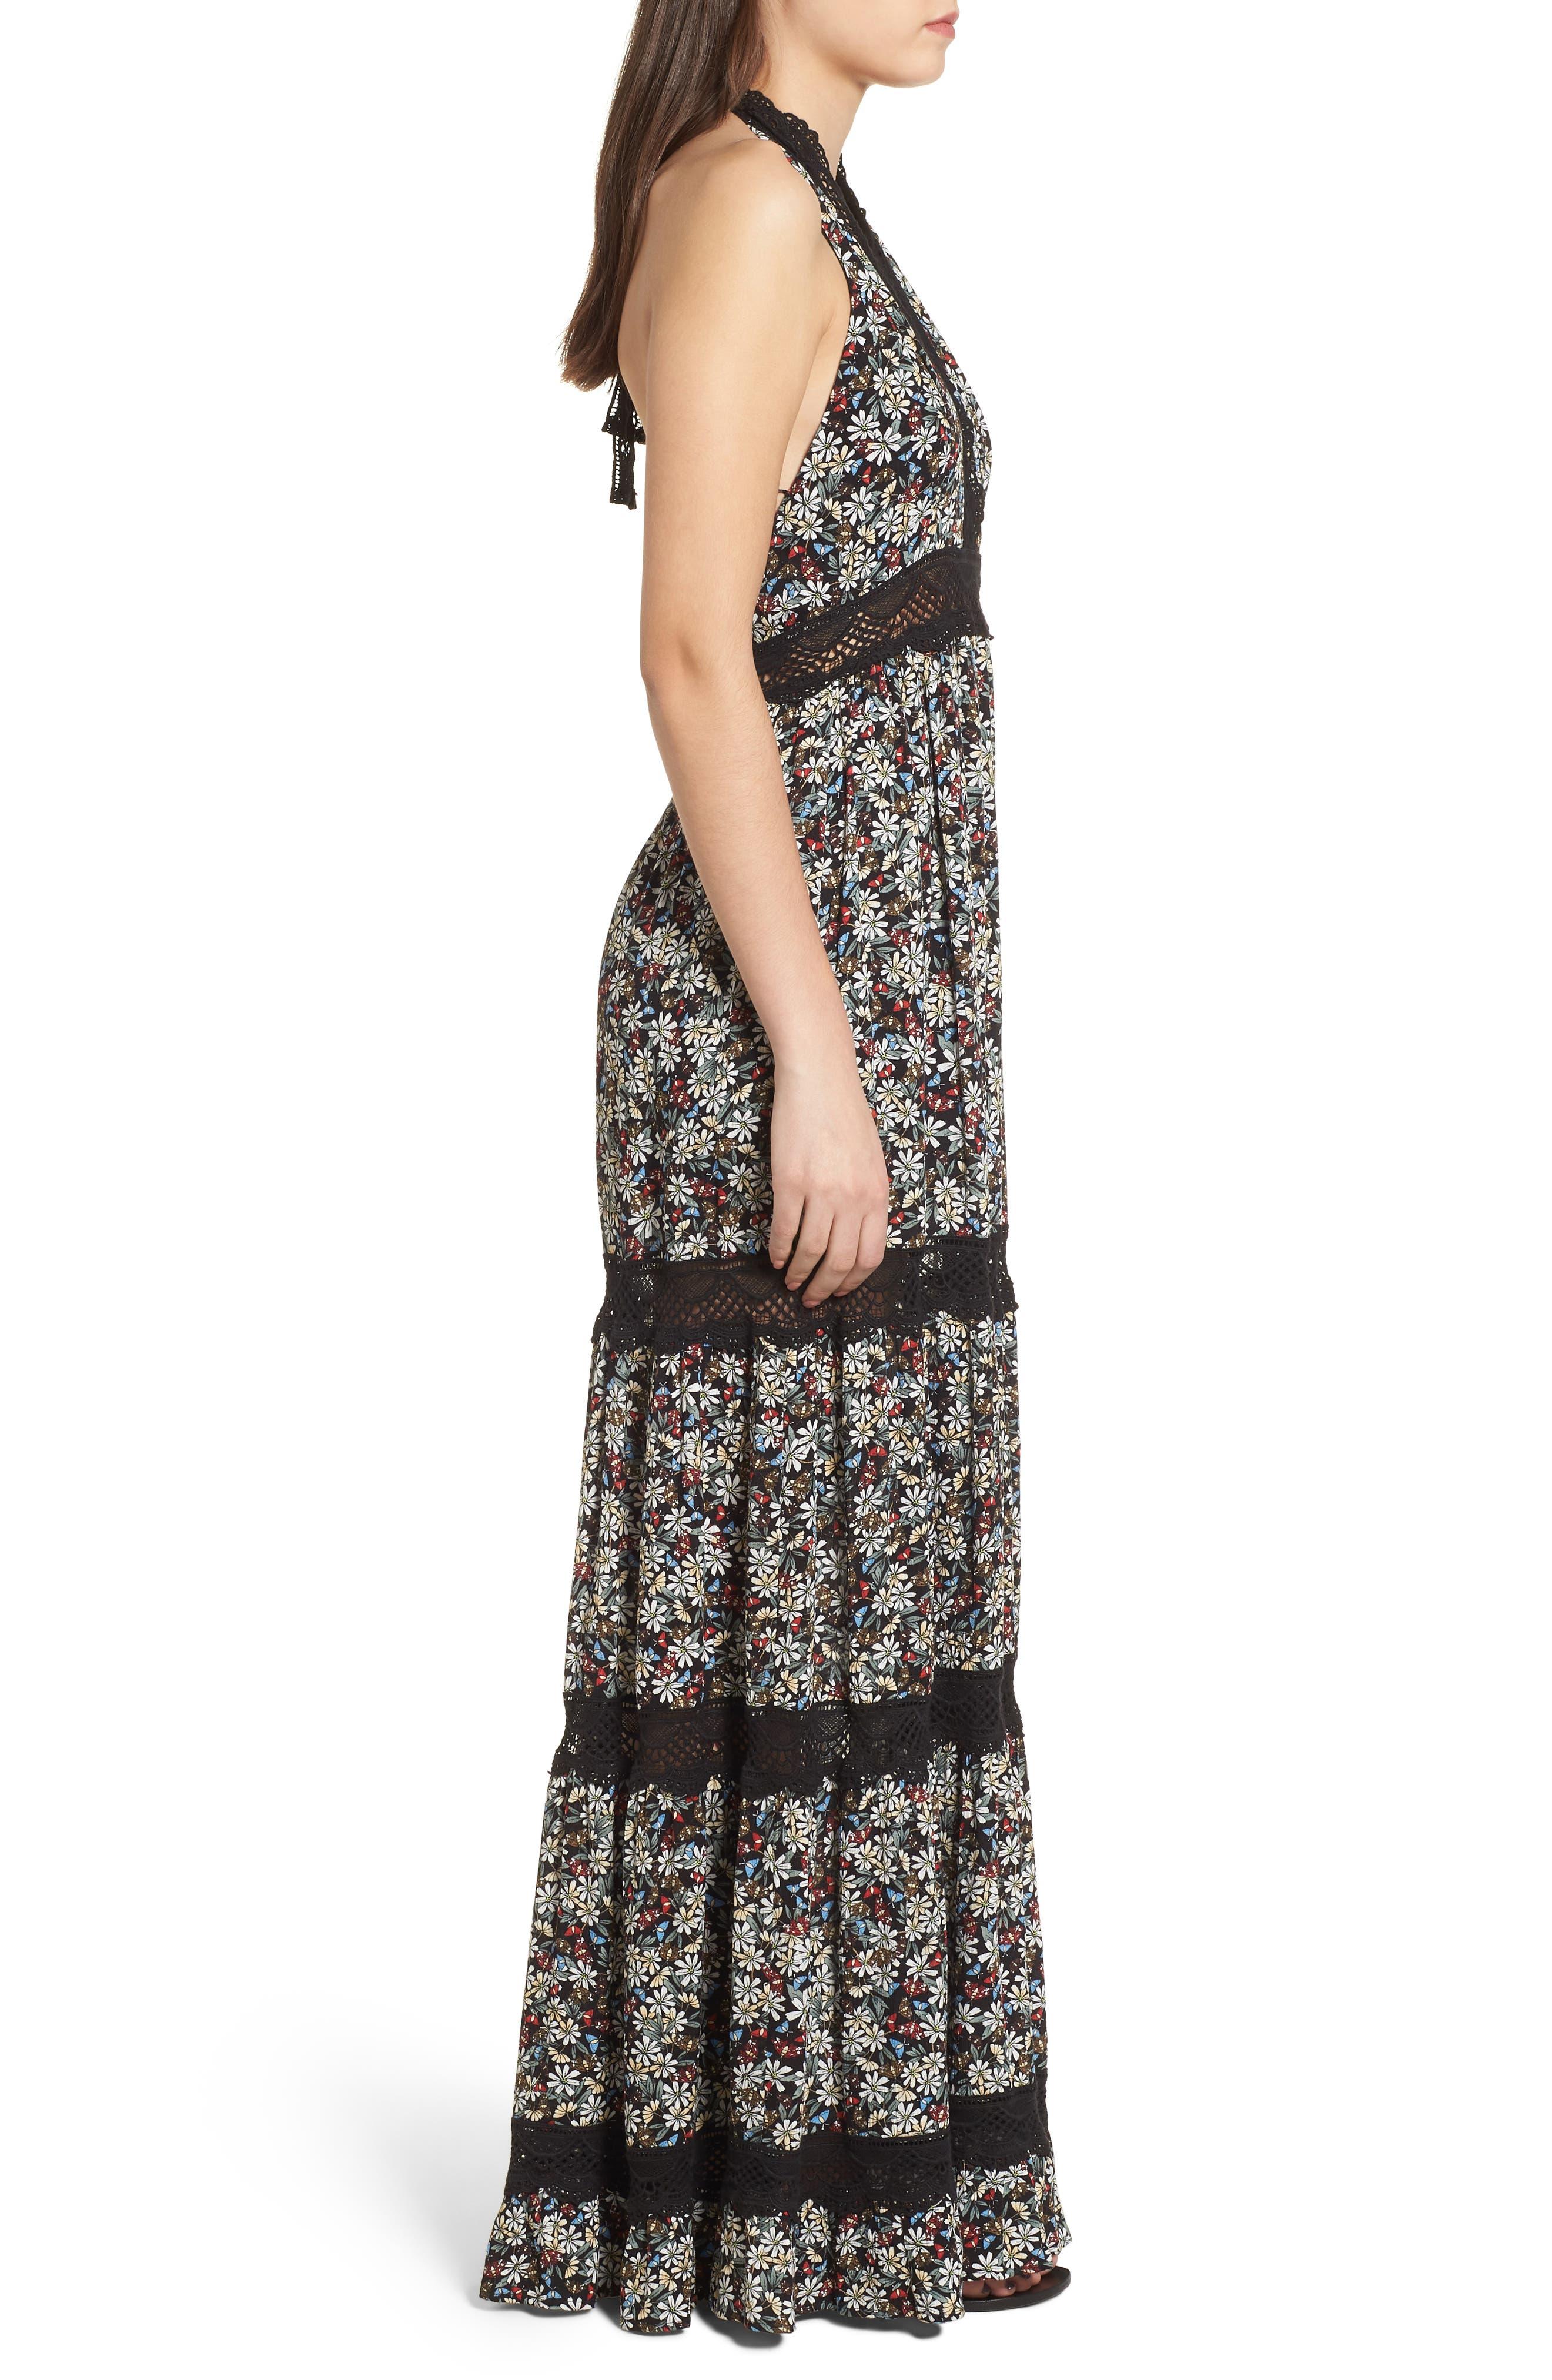 Flora Halter Neck Maxi Dress,                             Alternate thumbnail 4, color,                             Multi Black